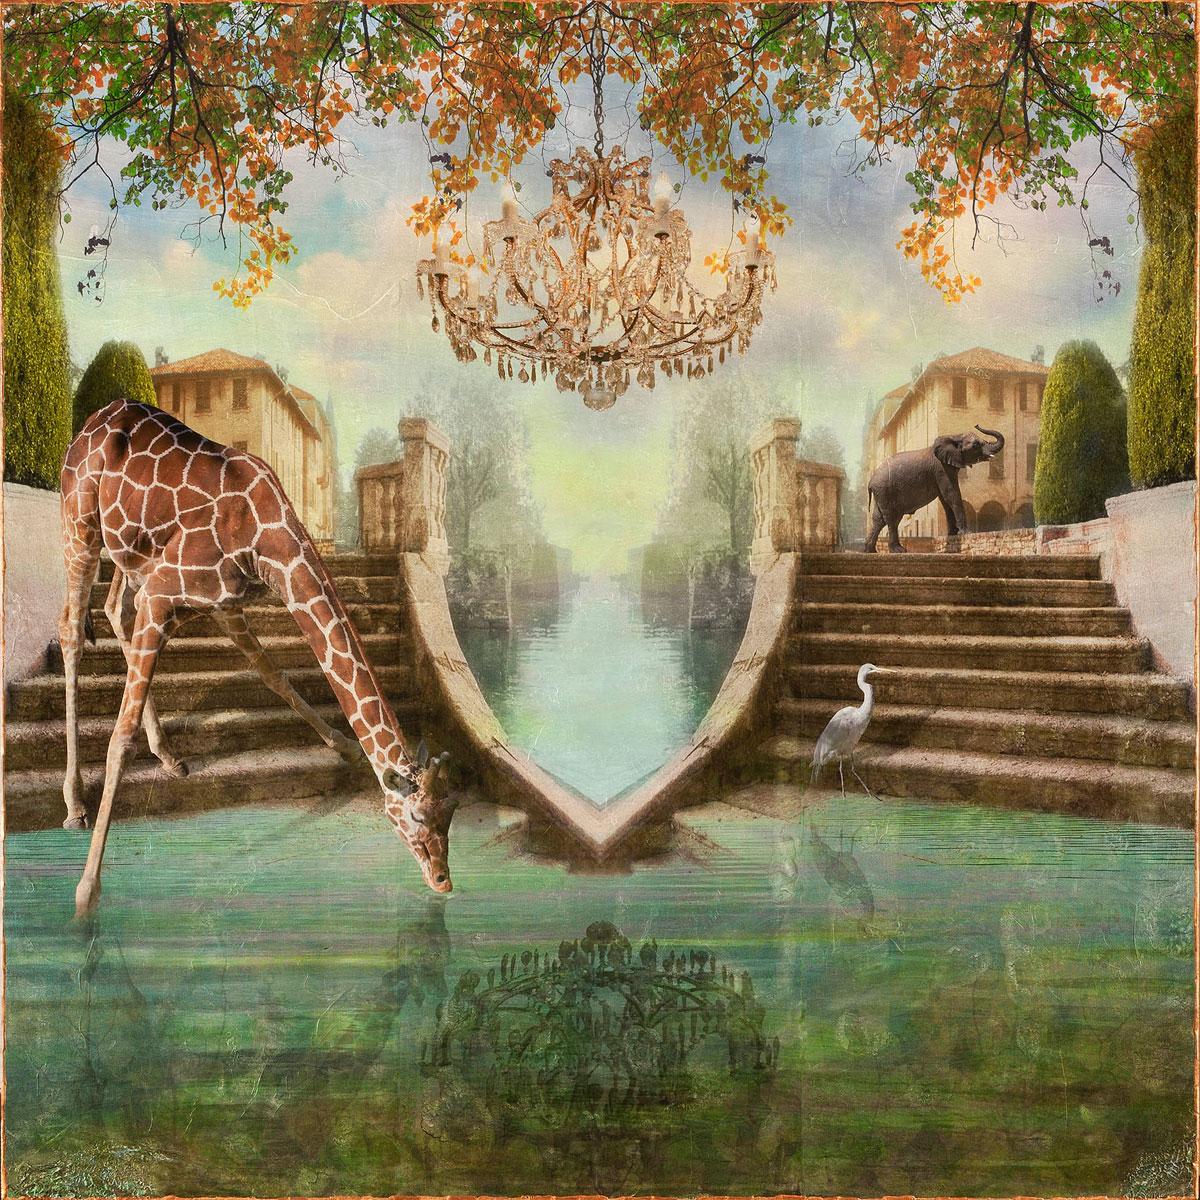 Mira III by Sondra Wampler